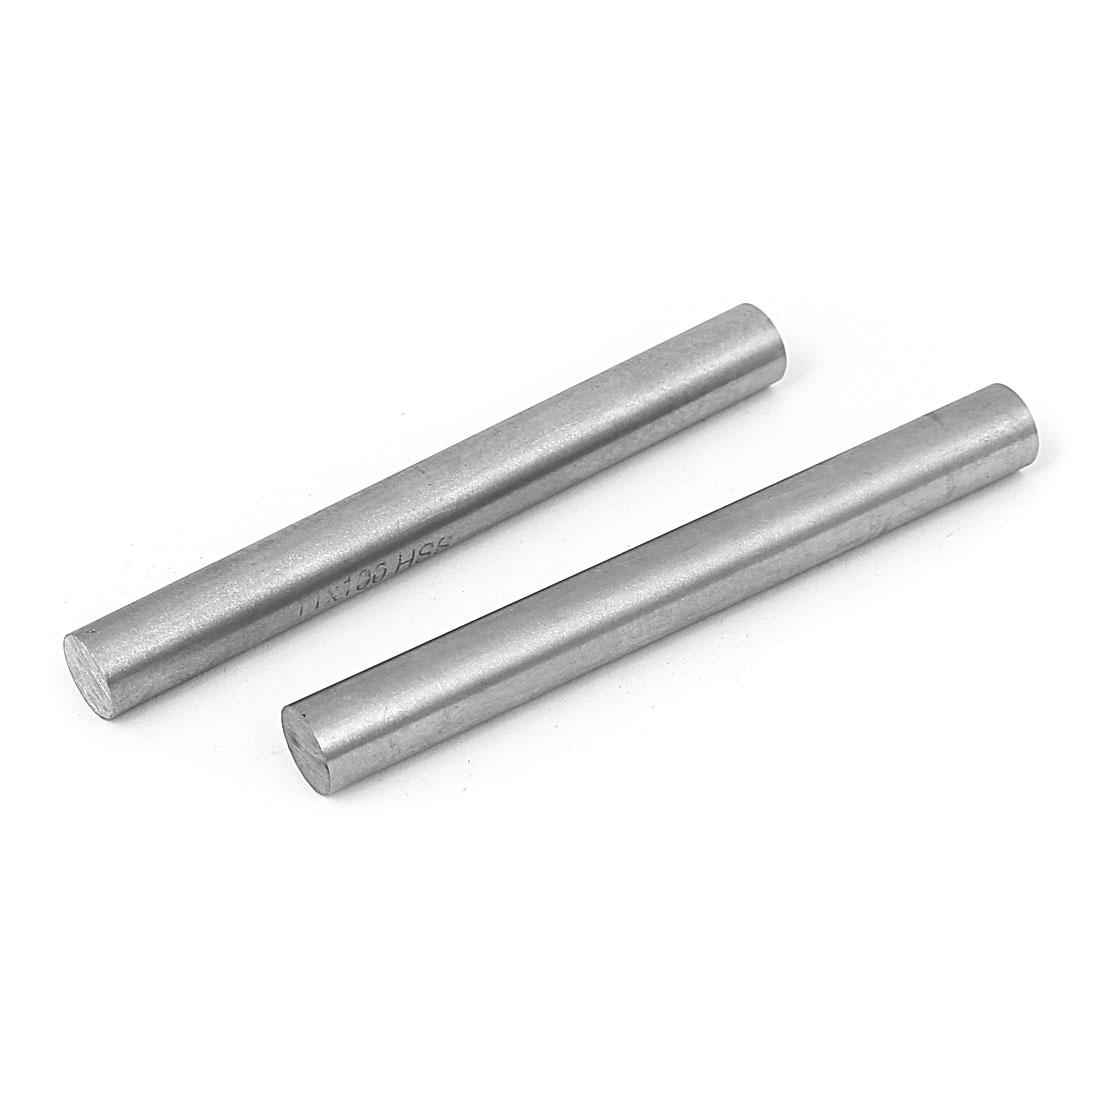 11mm x 100mm Metal Machine Turning Tools Rod Bar Lathe Round Stick 2pcs